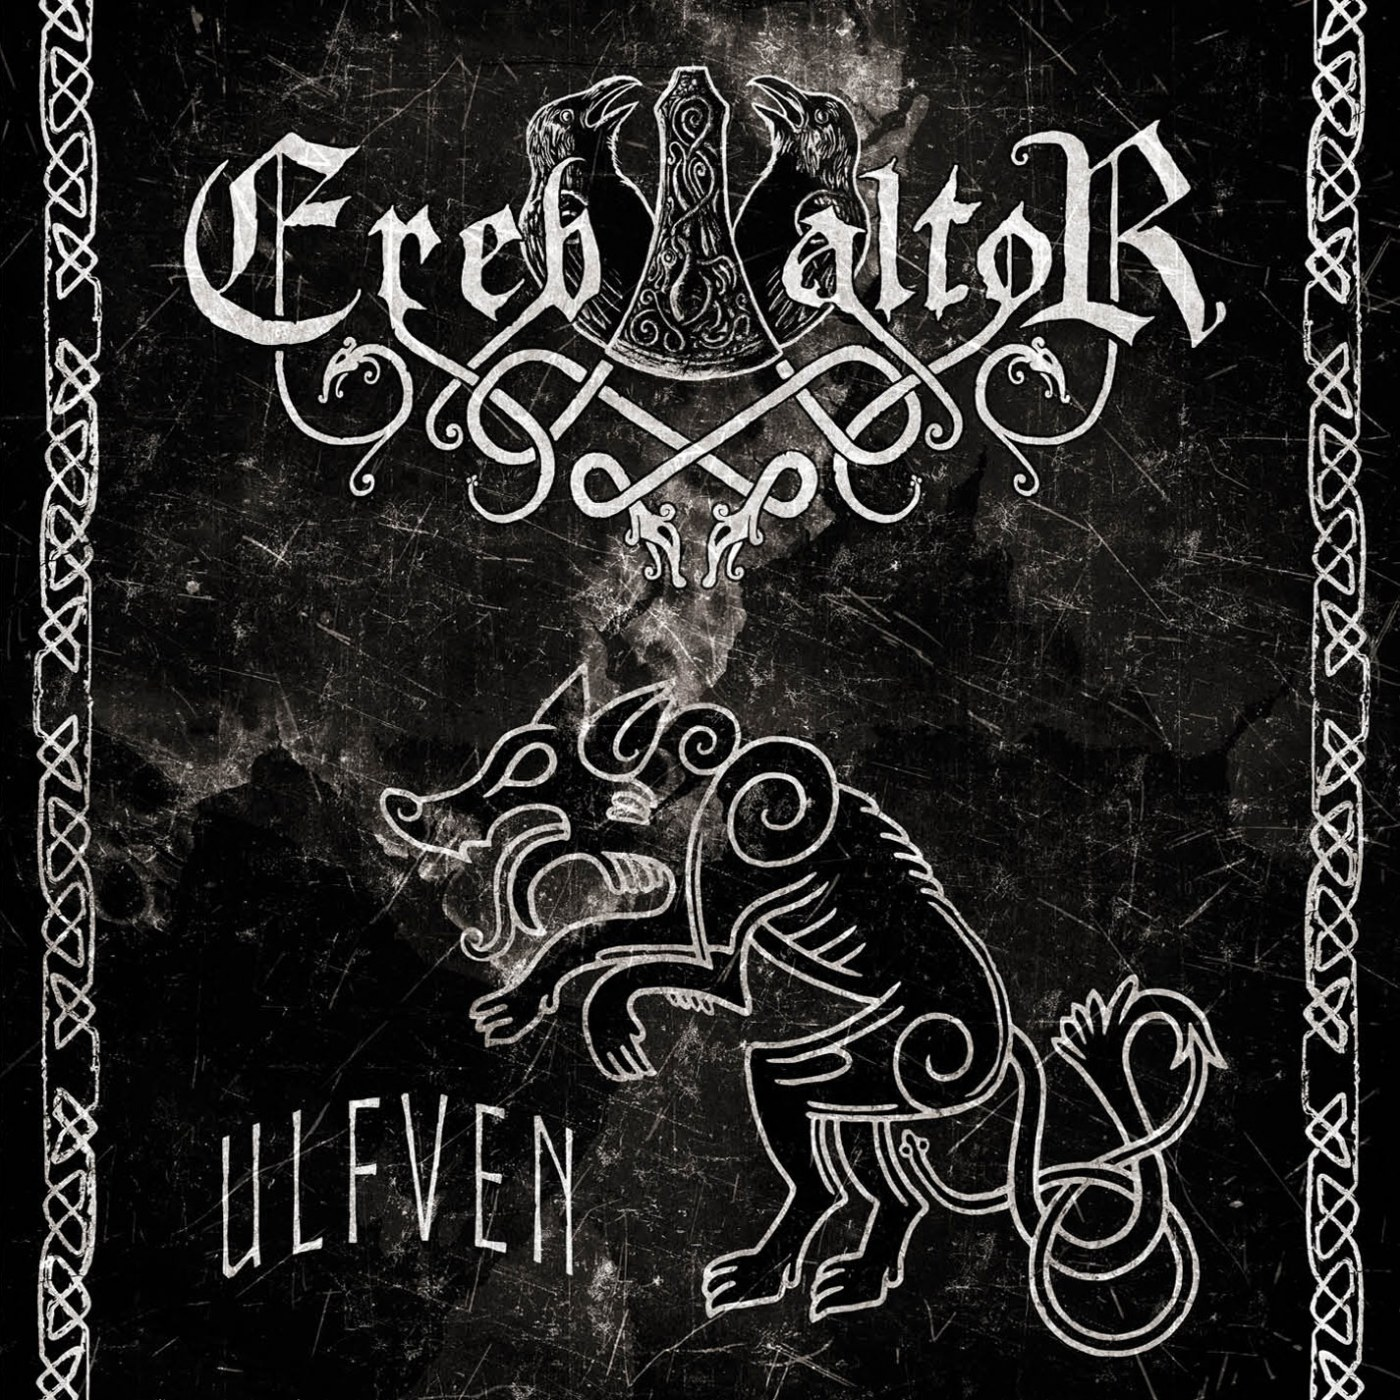 Review for Ereb Altor - Ulfven